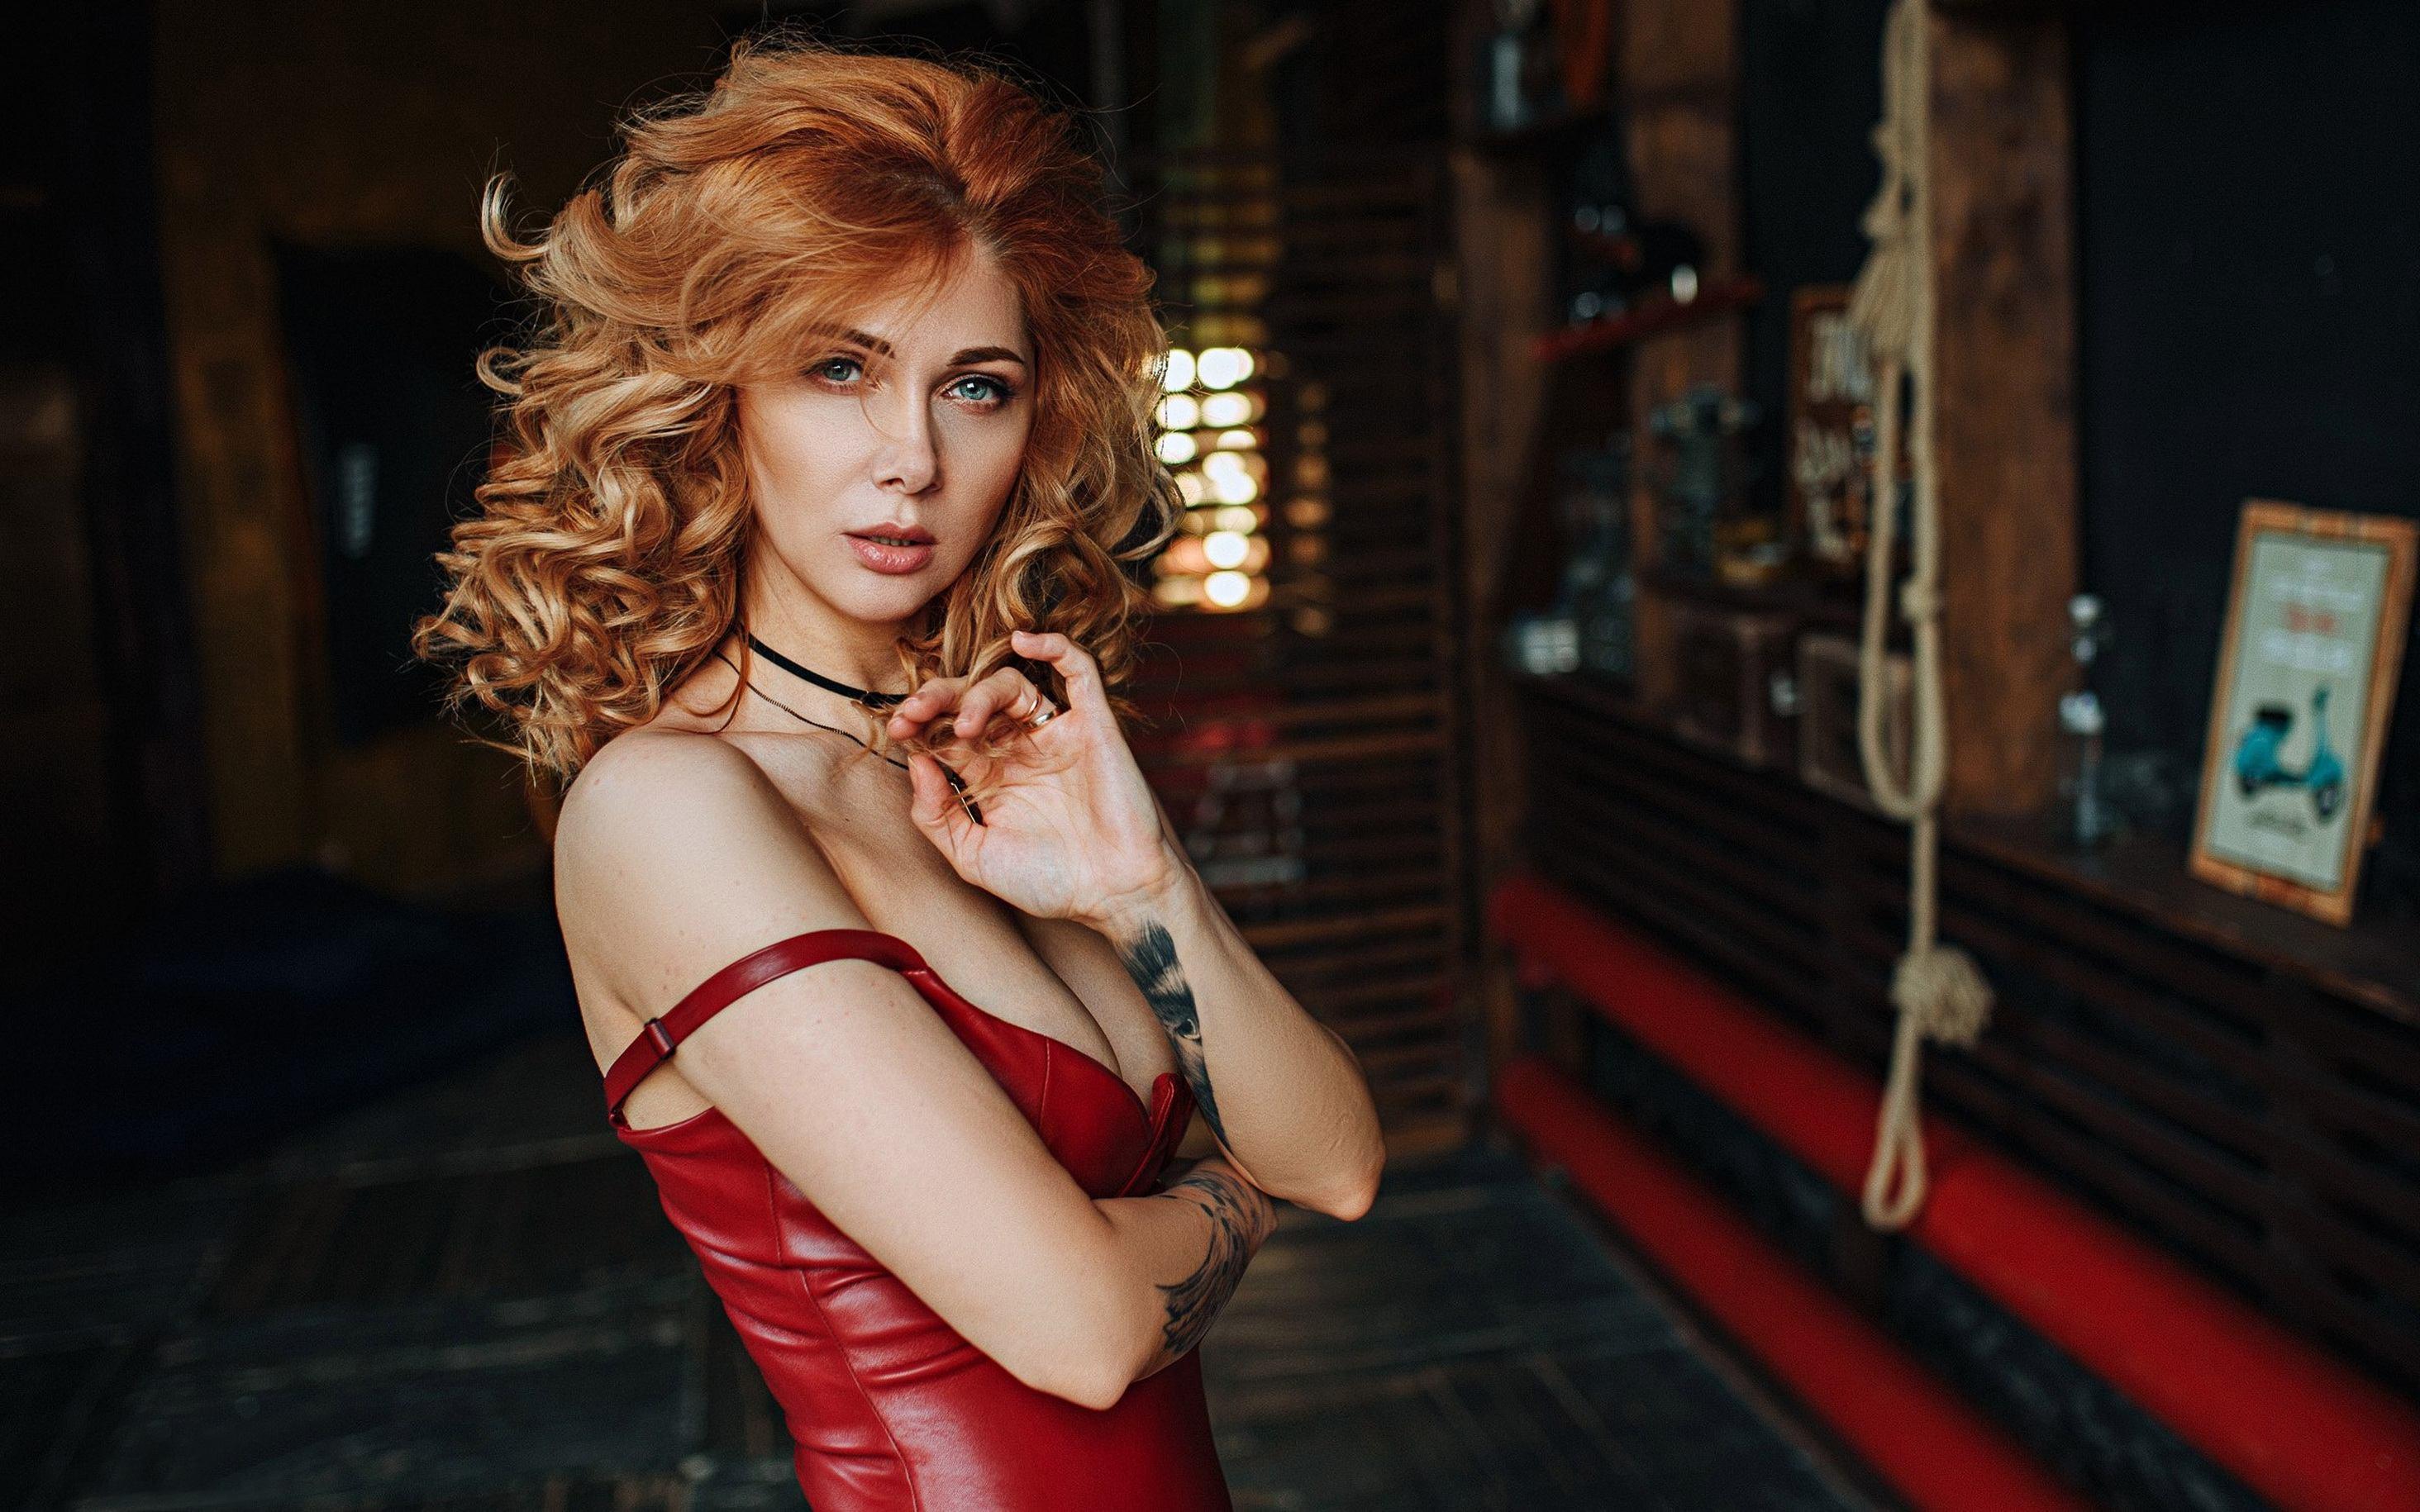 Redhead escorts